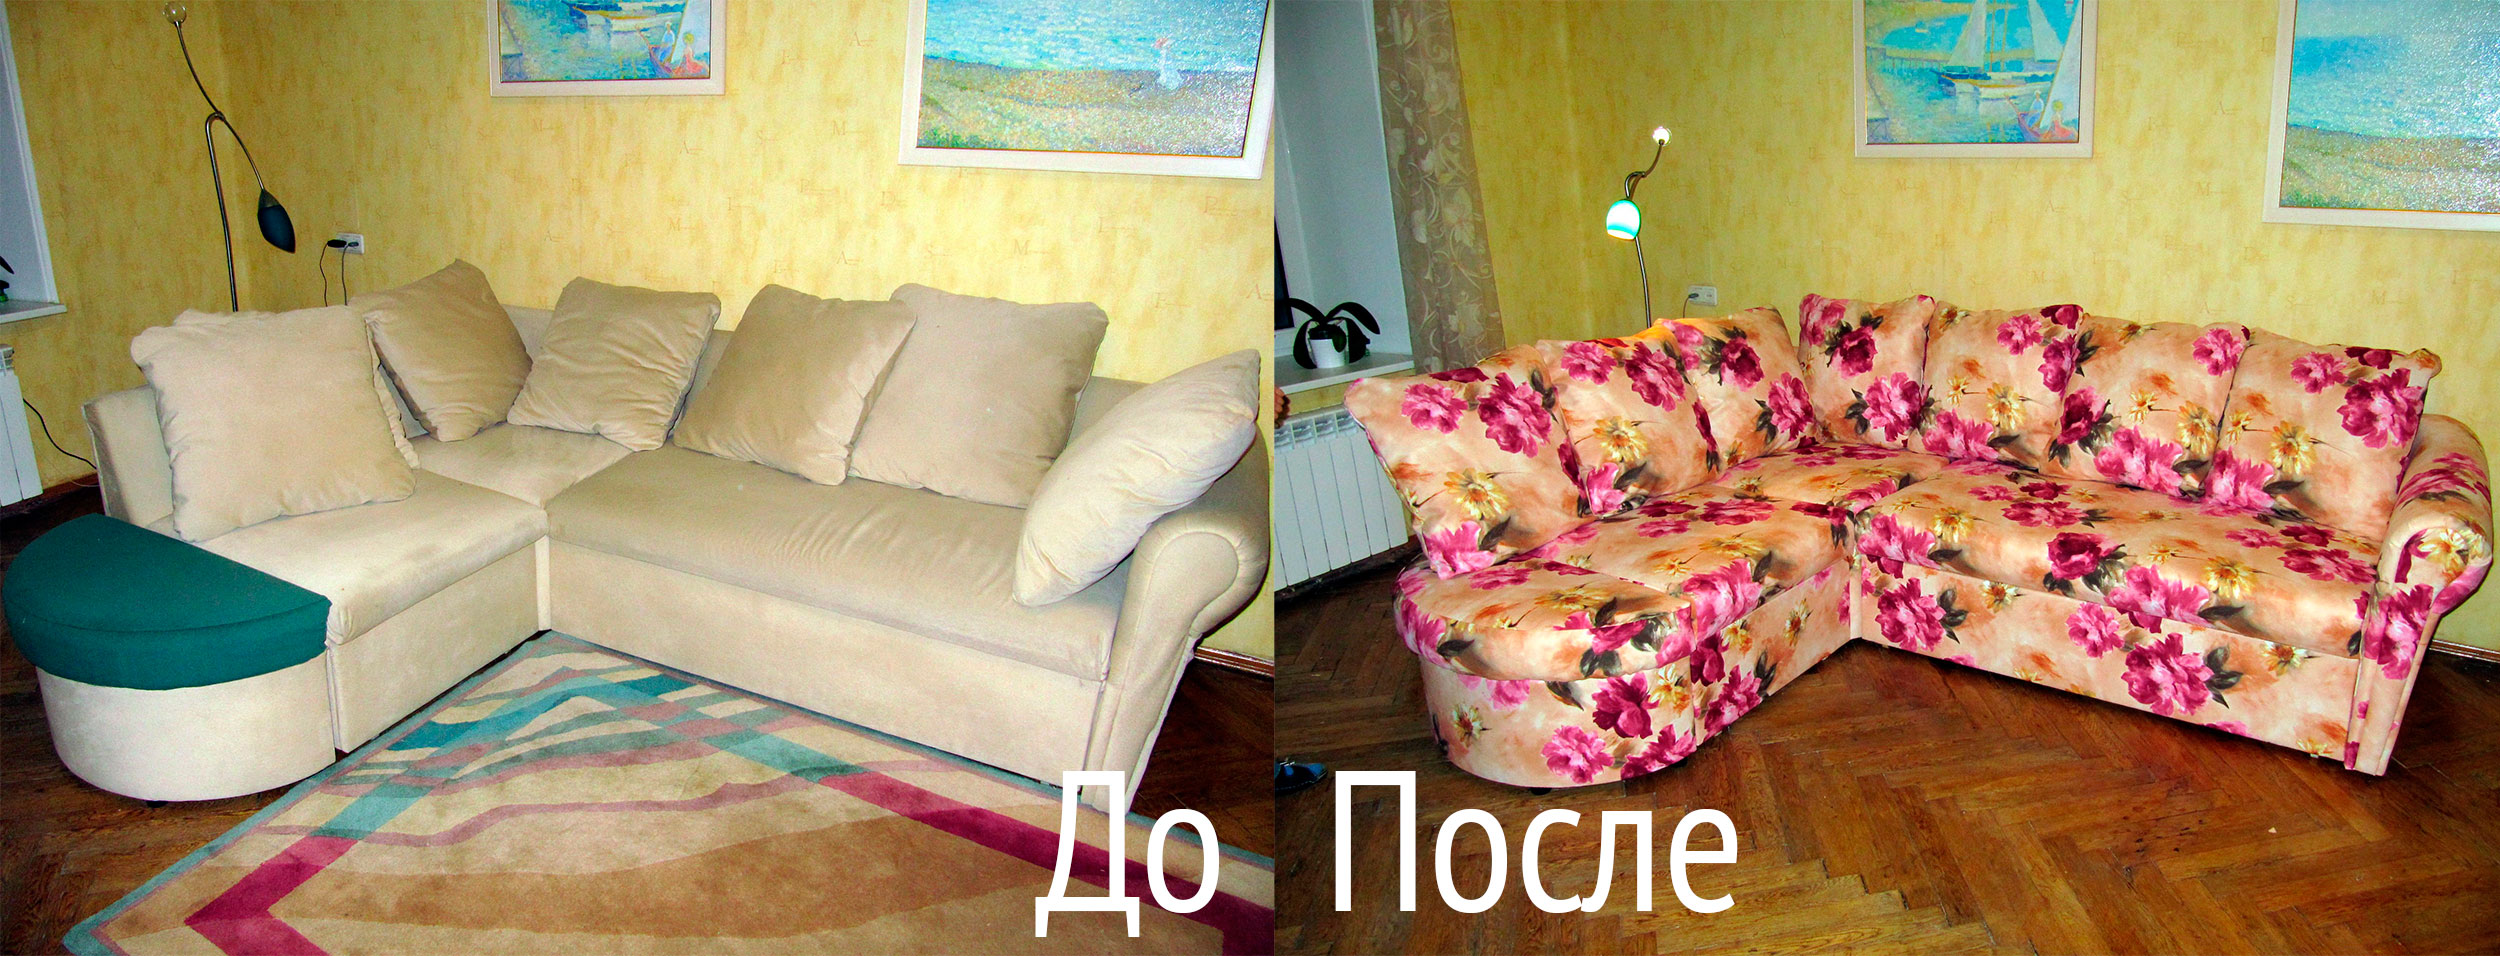 Пример обивки мягкой мебели